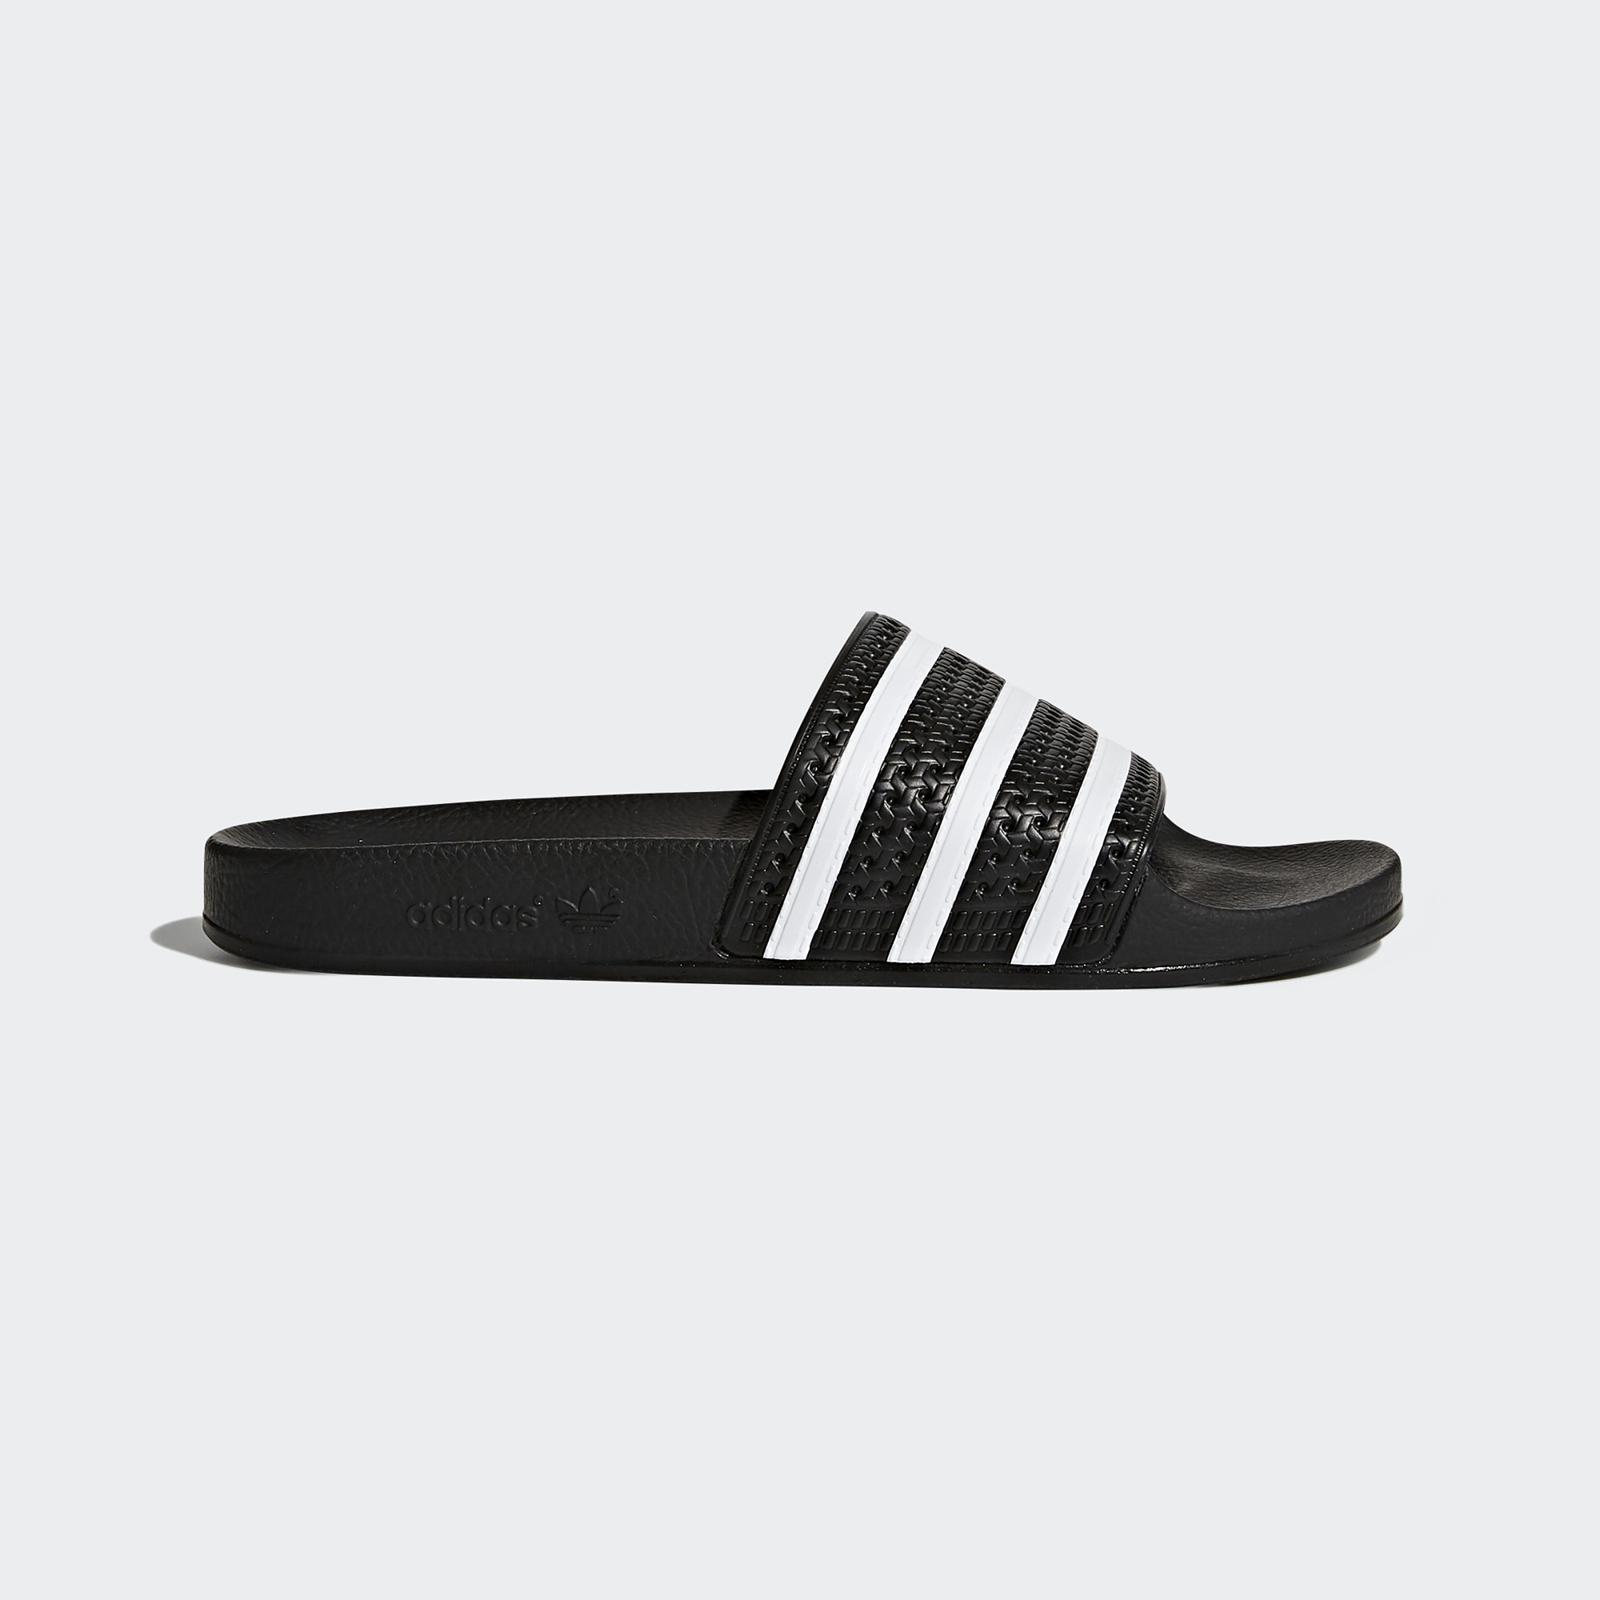 Шлепанцы мужские Adidas Adilette черные 5 UK